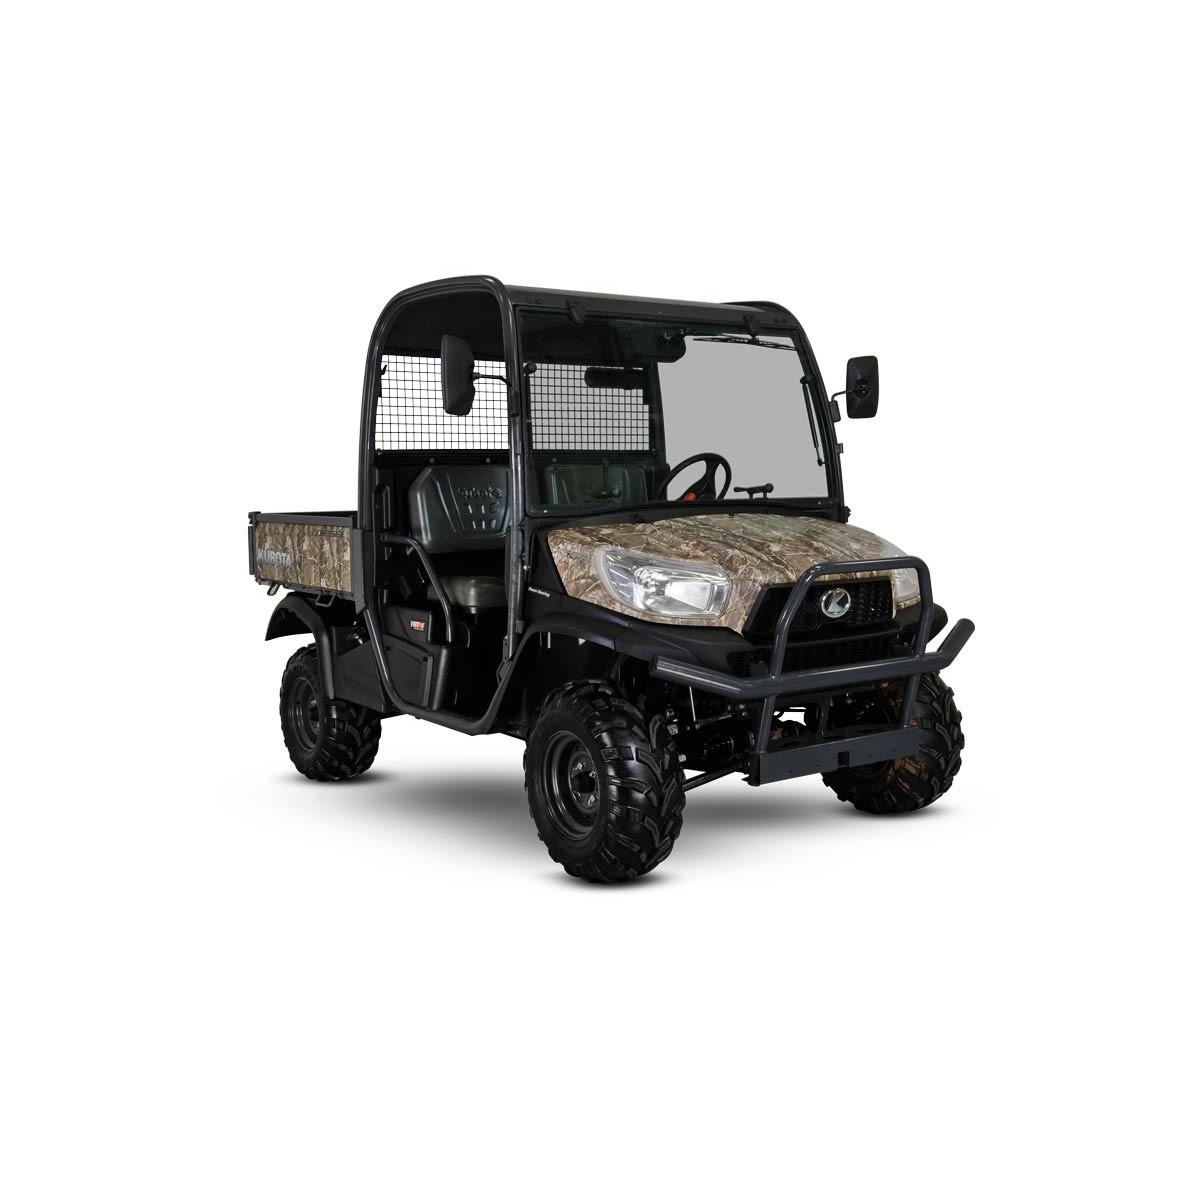 kubota vehiculo multiusos diesel (rtv-x900) 21cv cajon basculante 430l